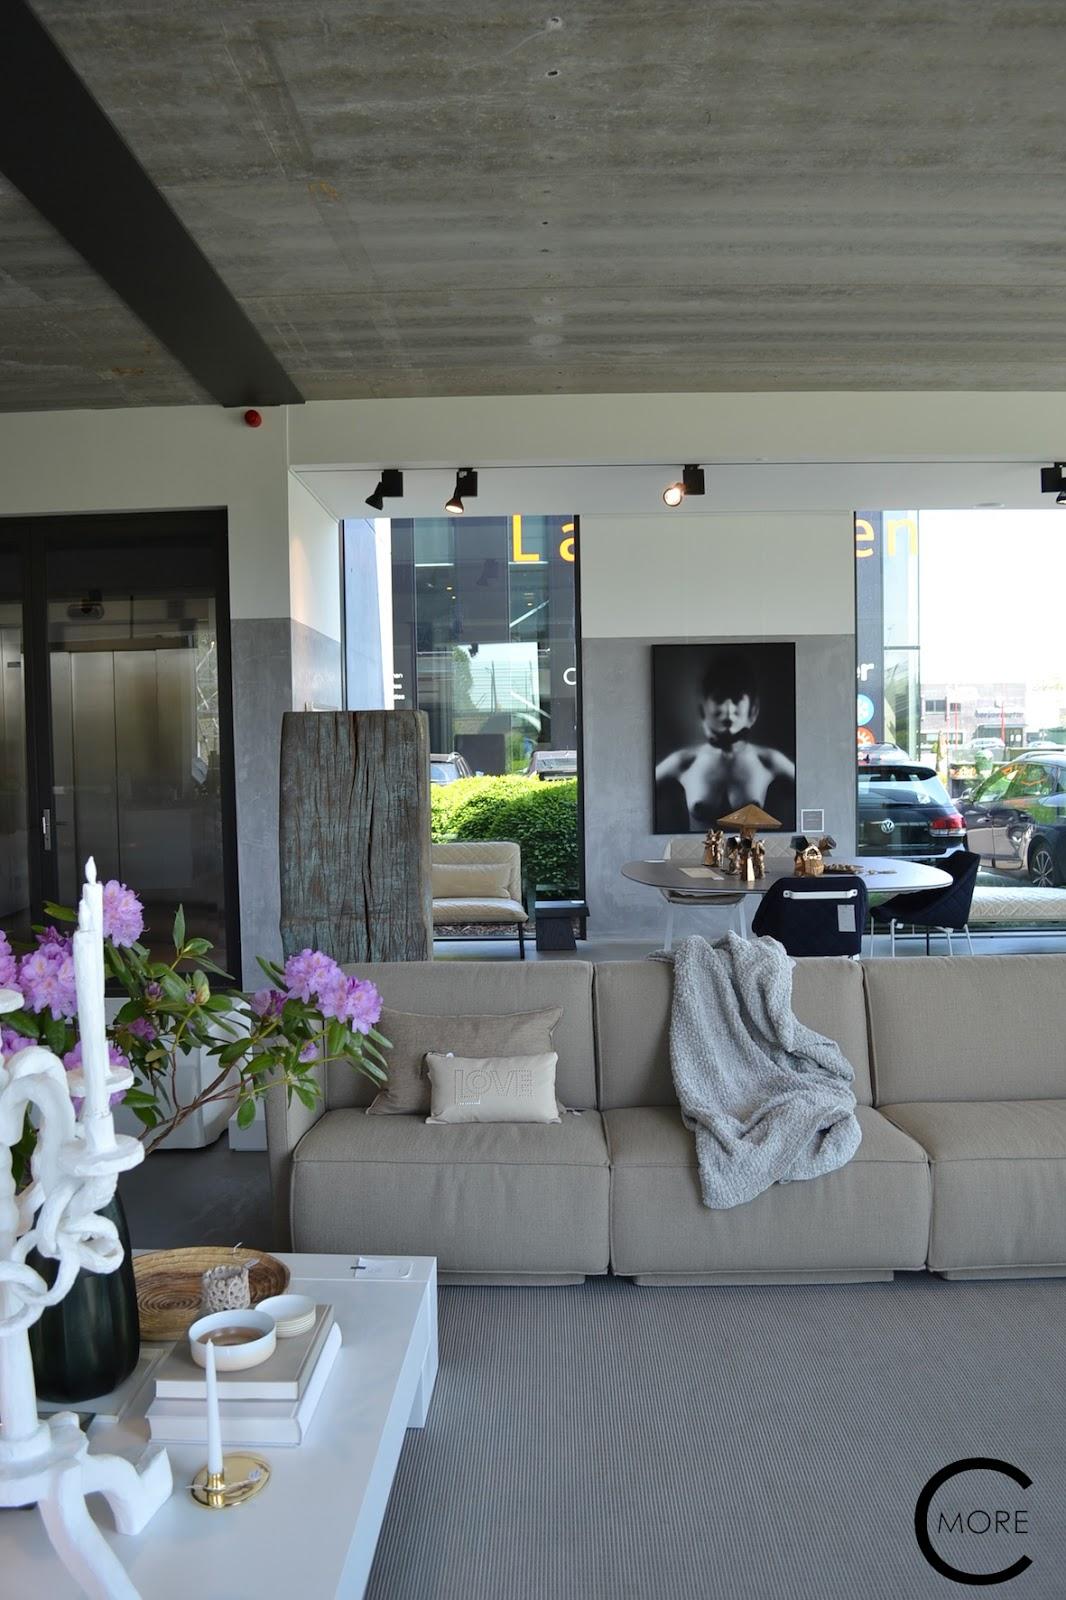 C-More Interieuradvies blog Interior and Design blog:Piet Boon en ...